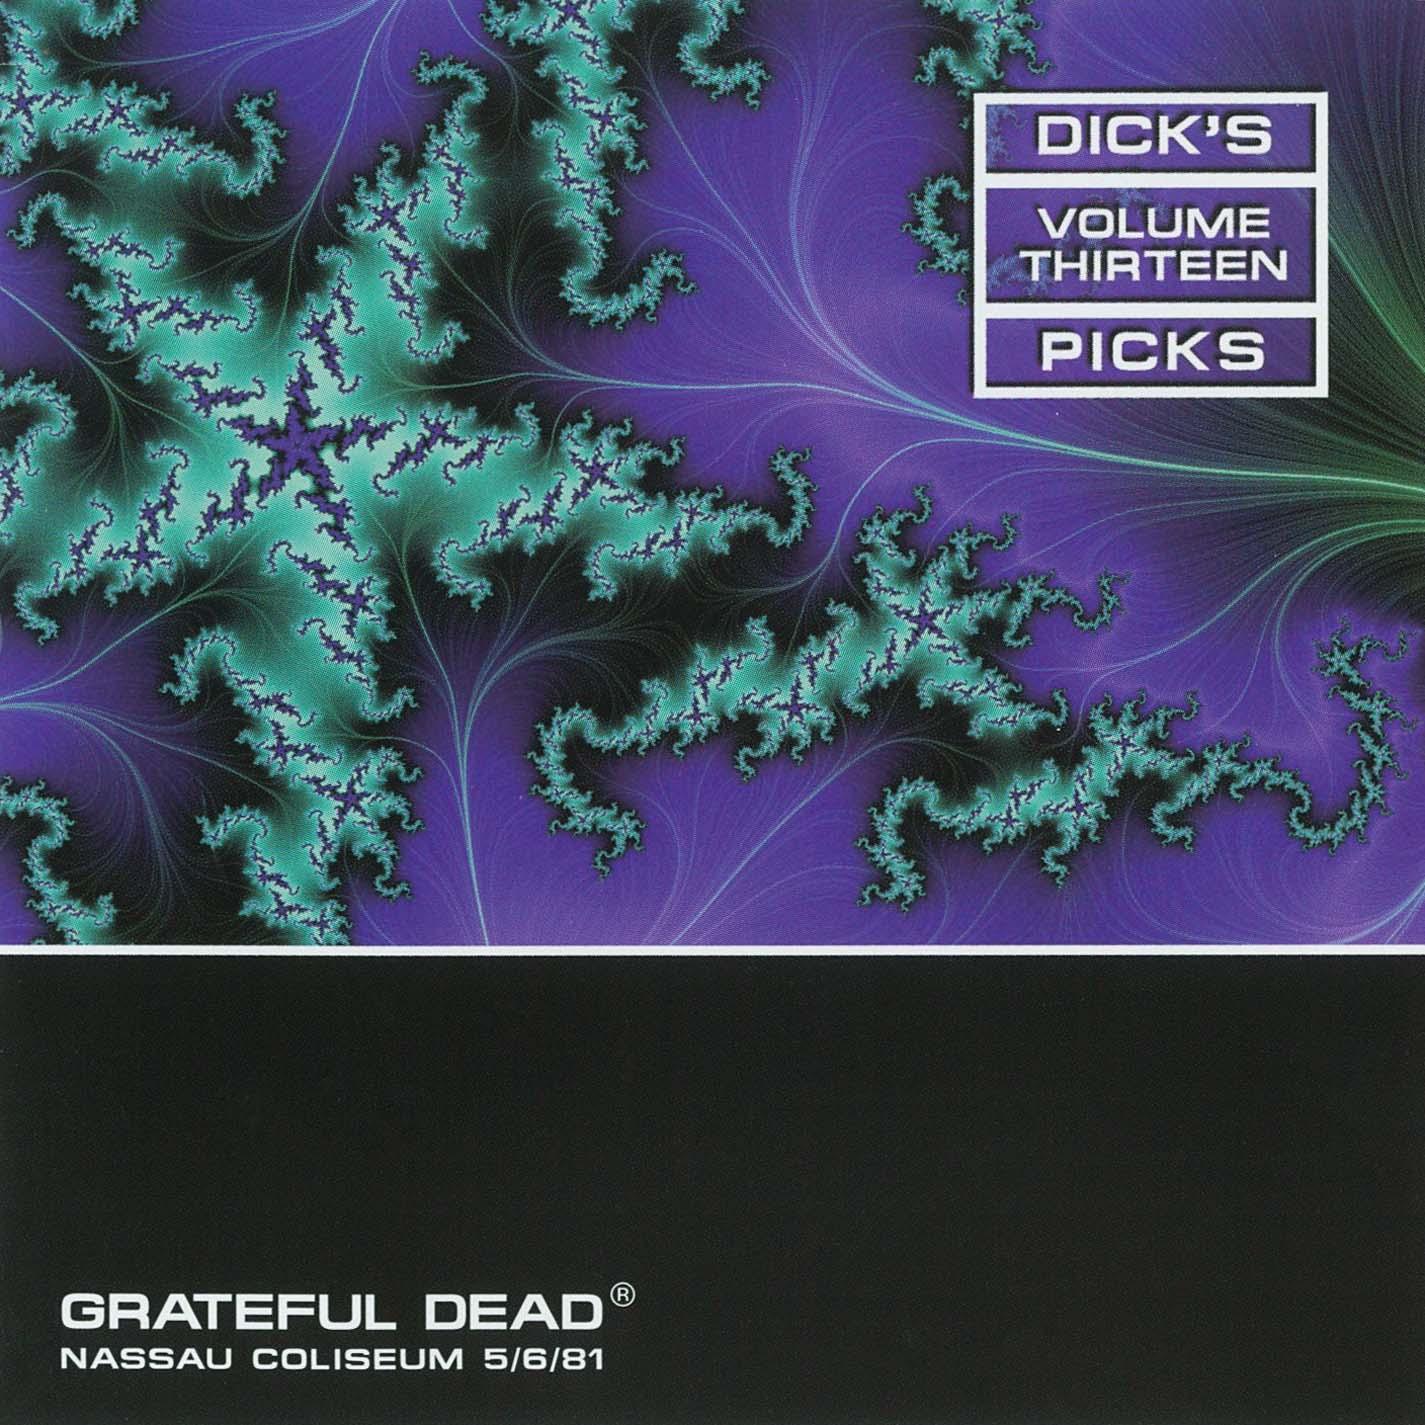 grateful dead dicks picks jpg 853x1280